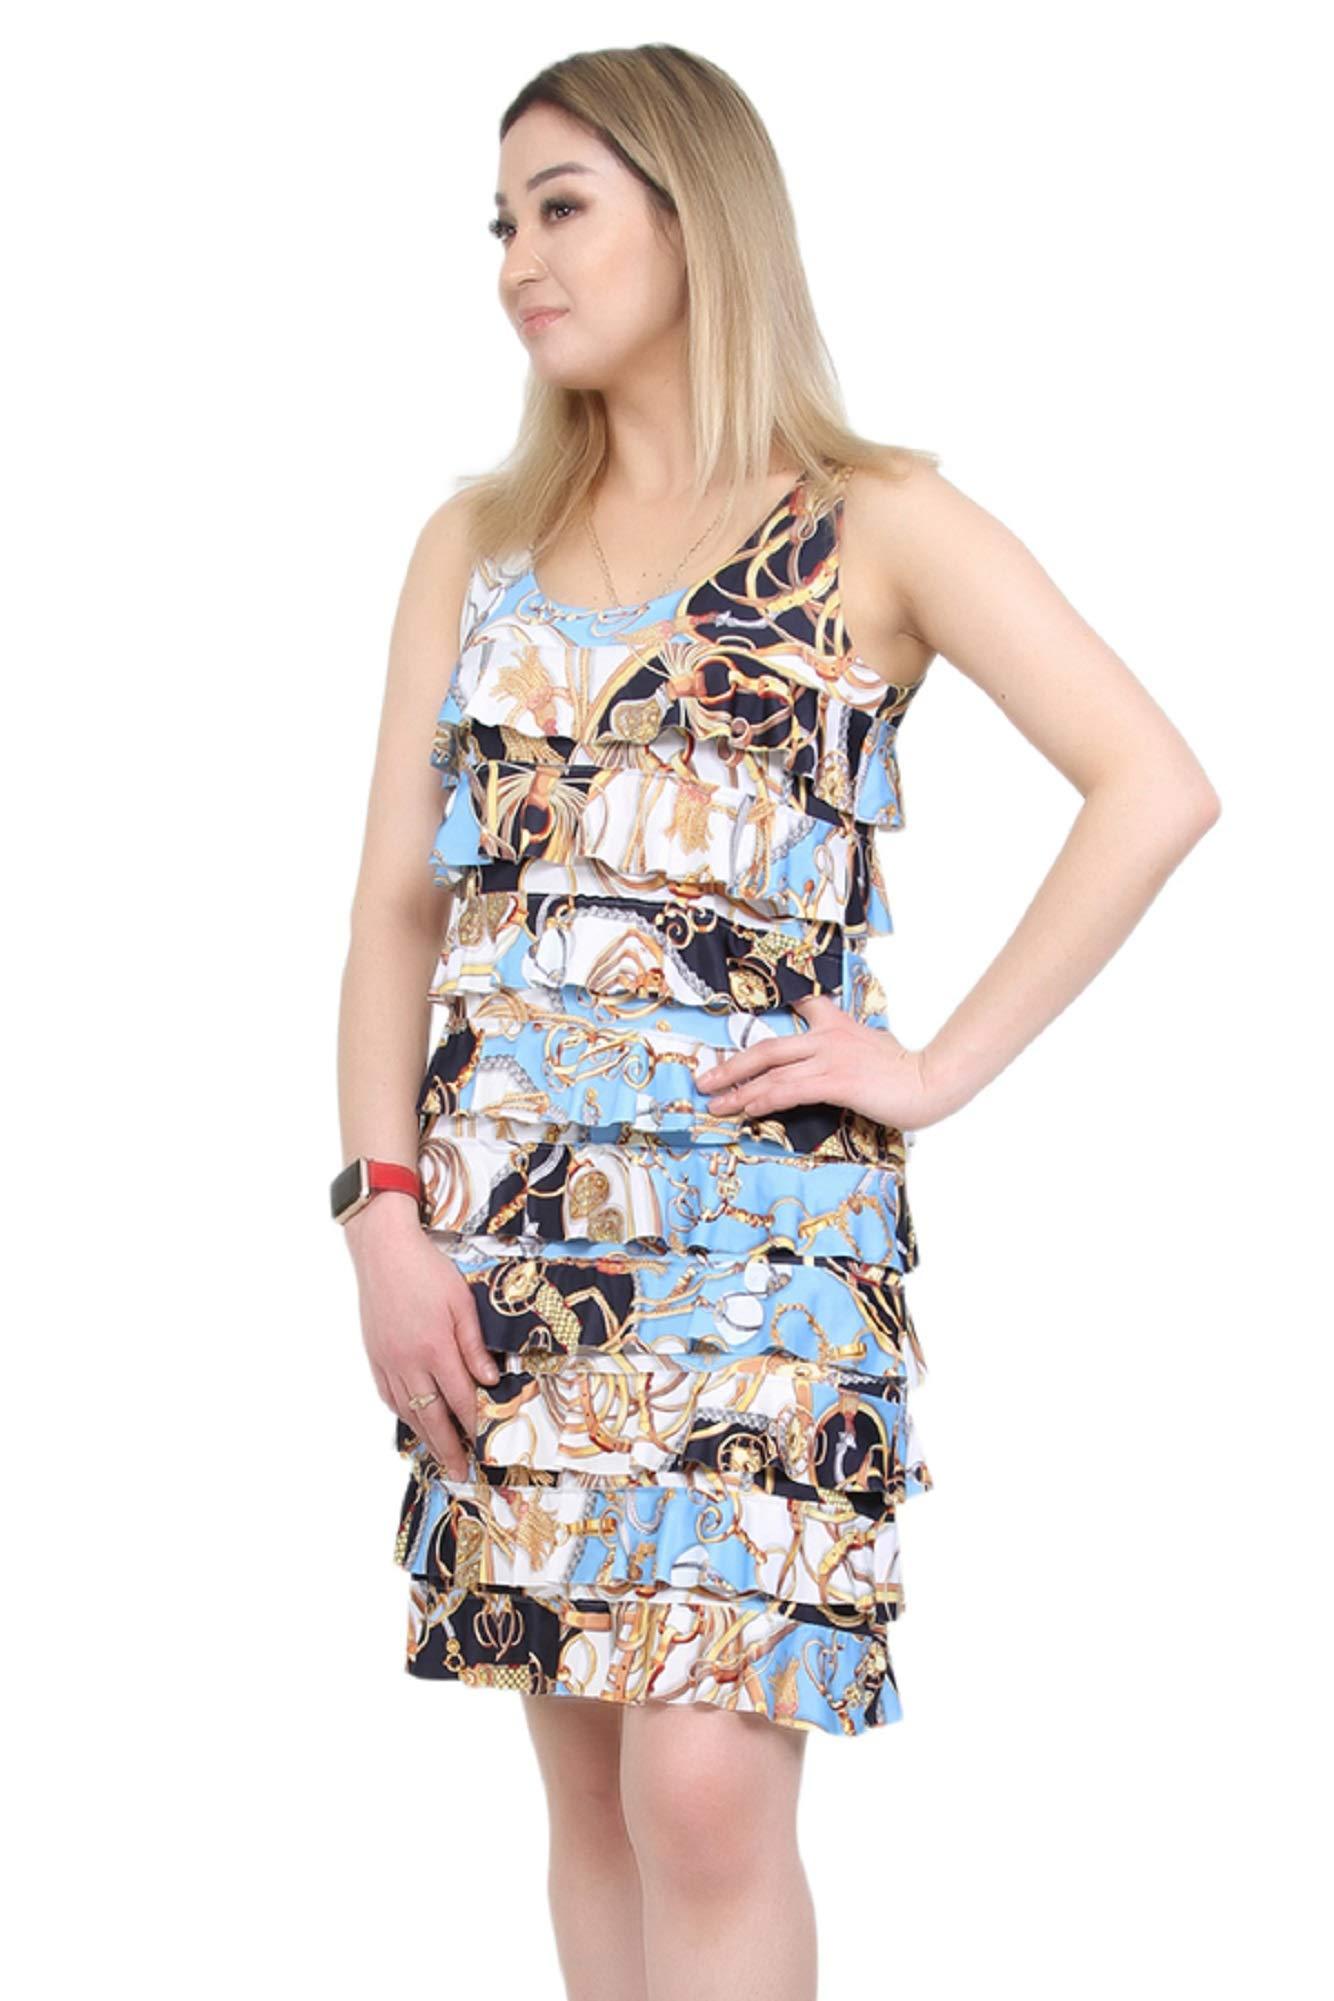 Isle Apparel by Melis Kozan Cha Cha Dress by Isle Apparel by Melis Kozan